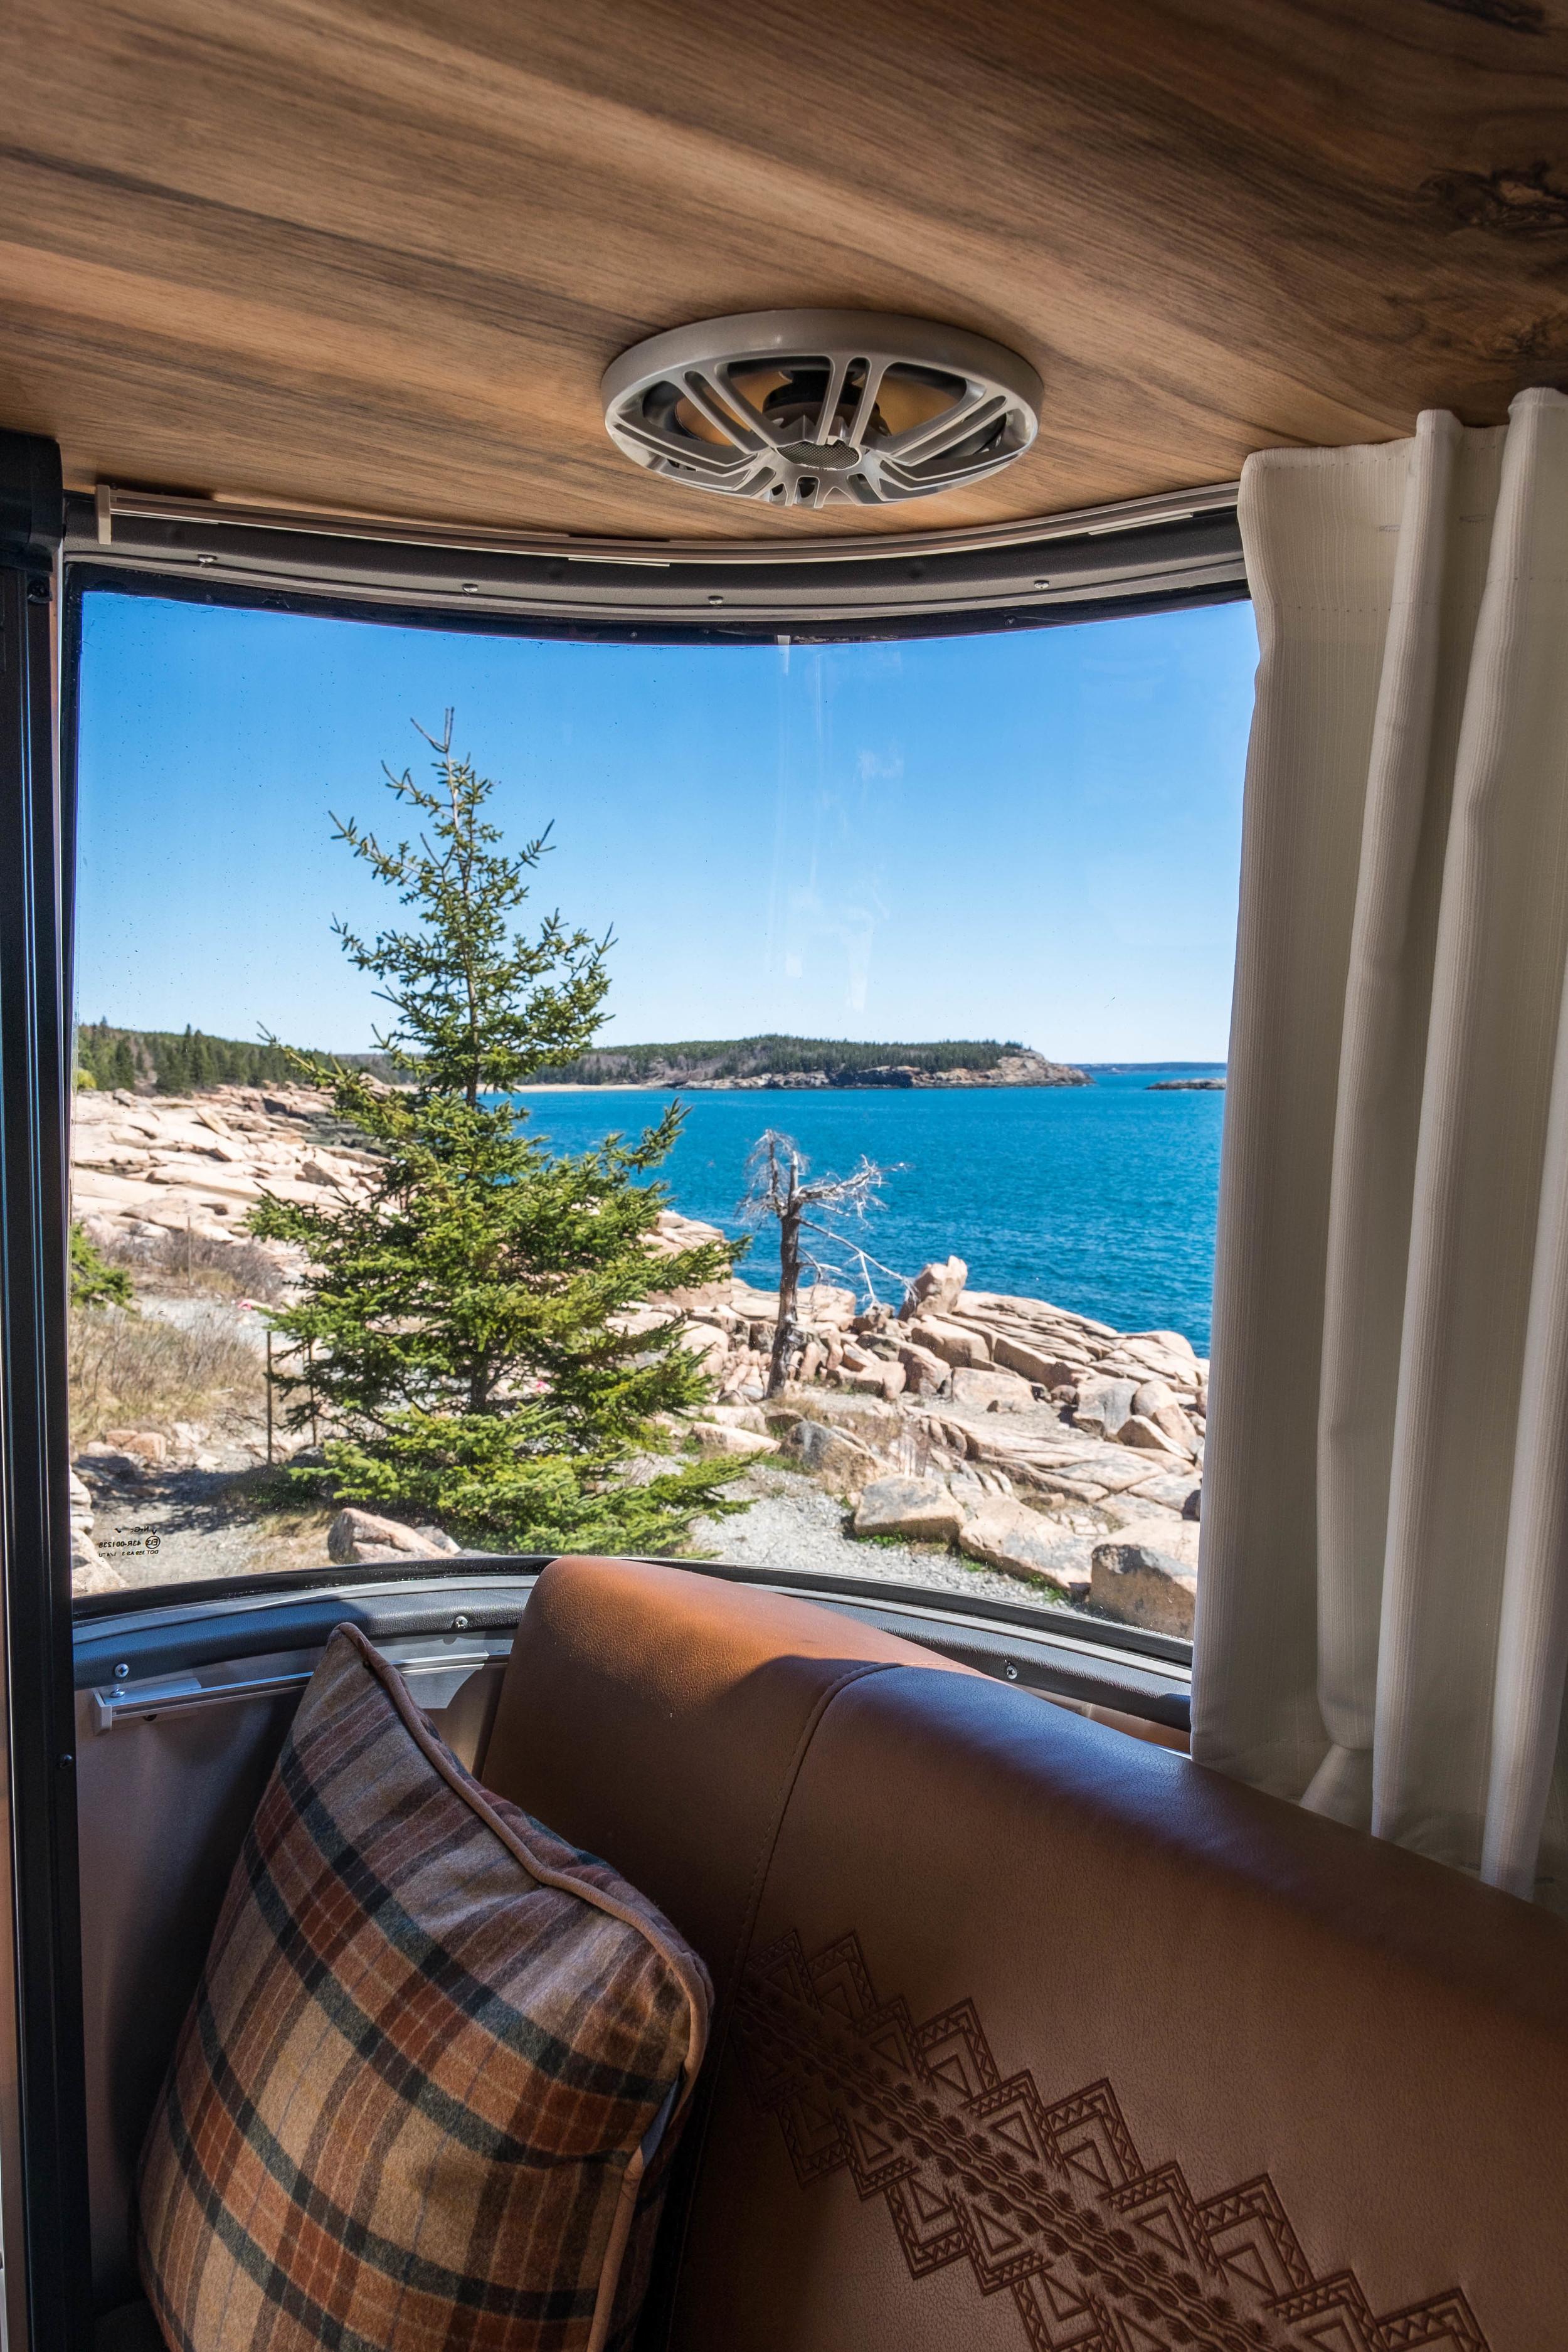 20160429-JI-Acadia National Park-_DSF7551.jpg